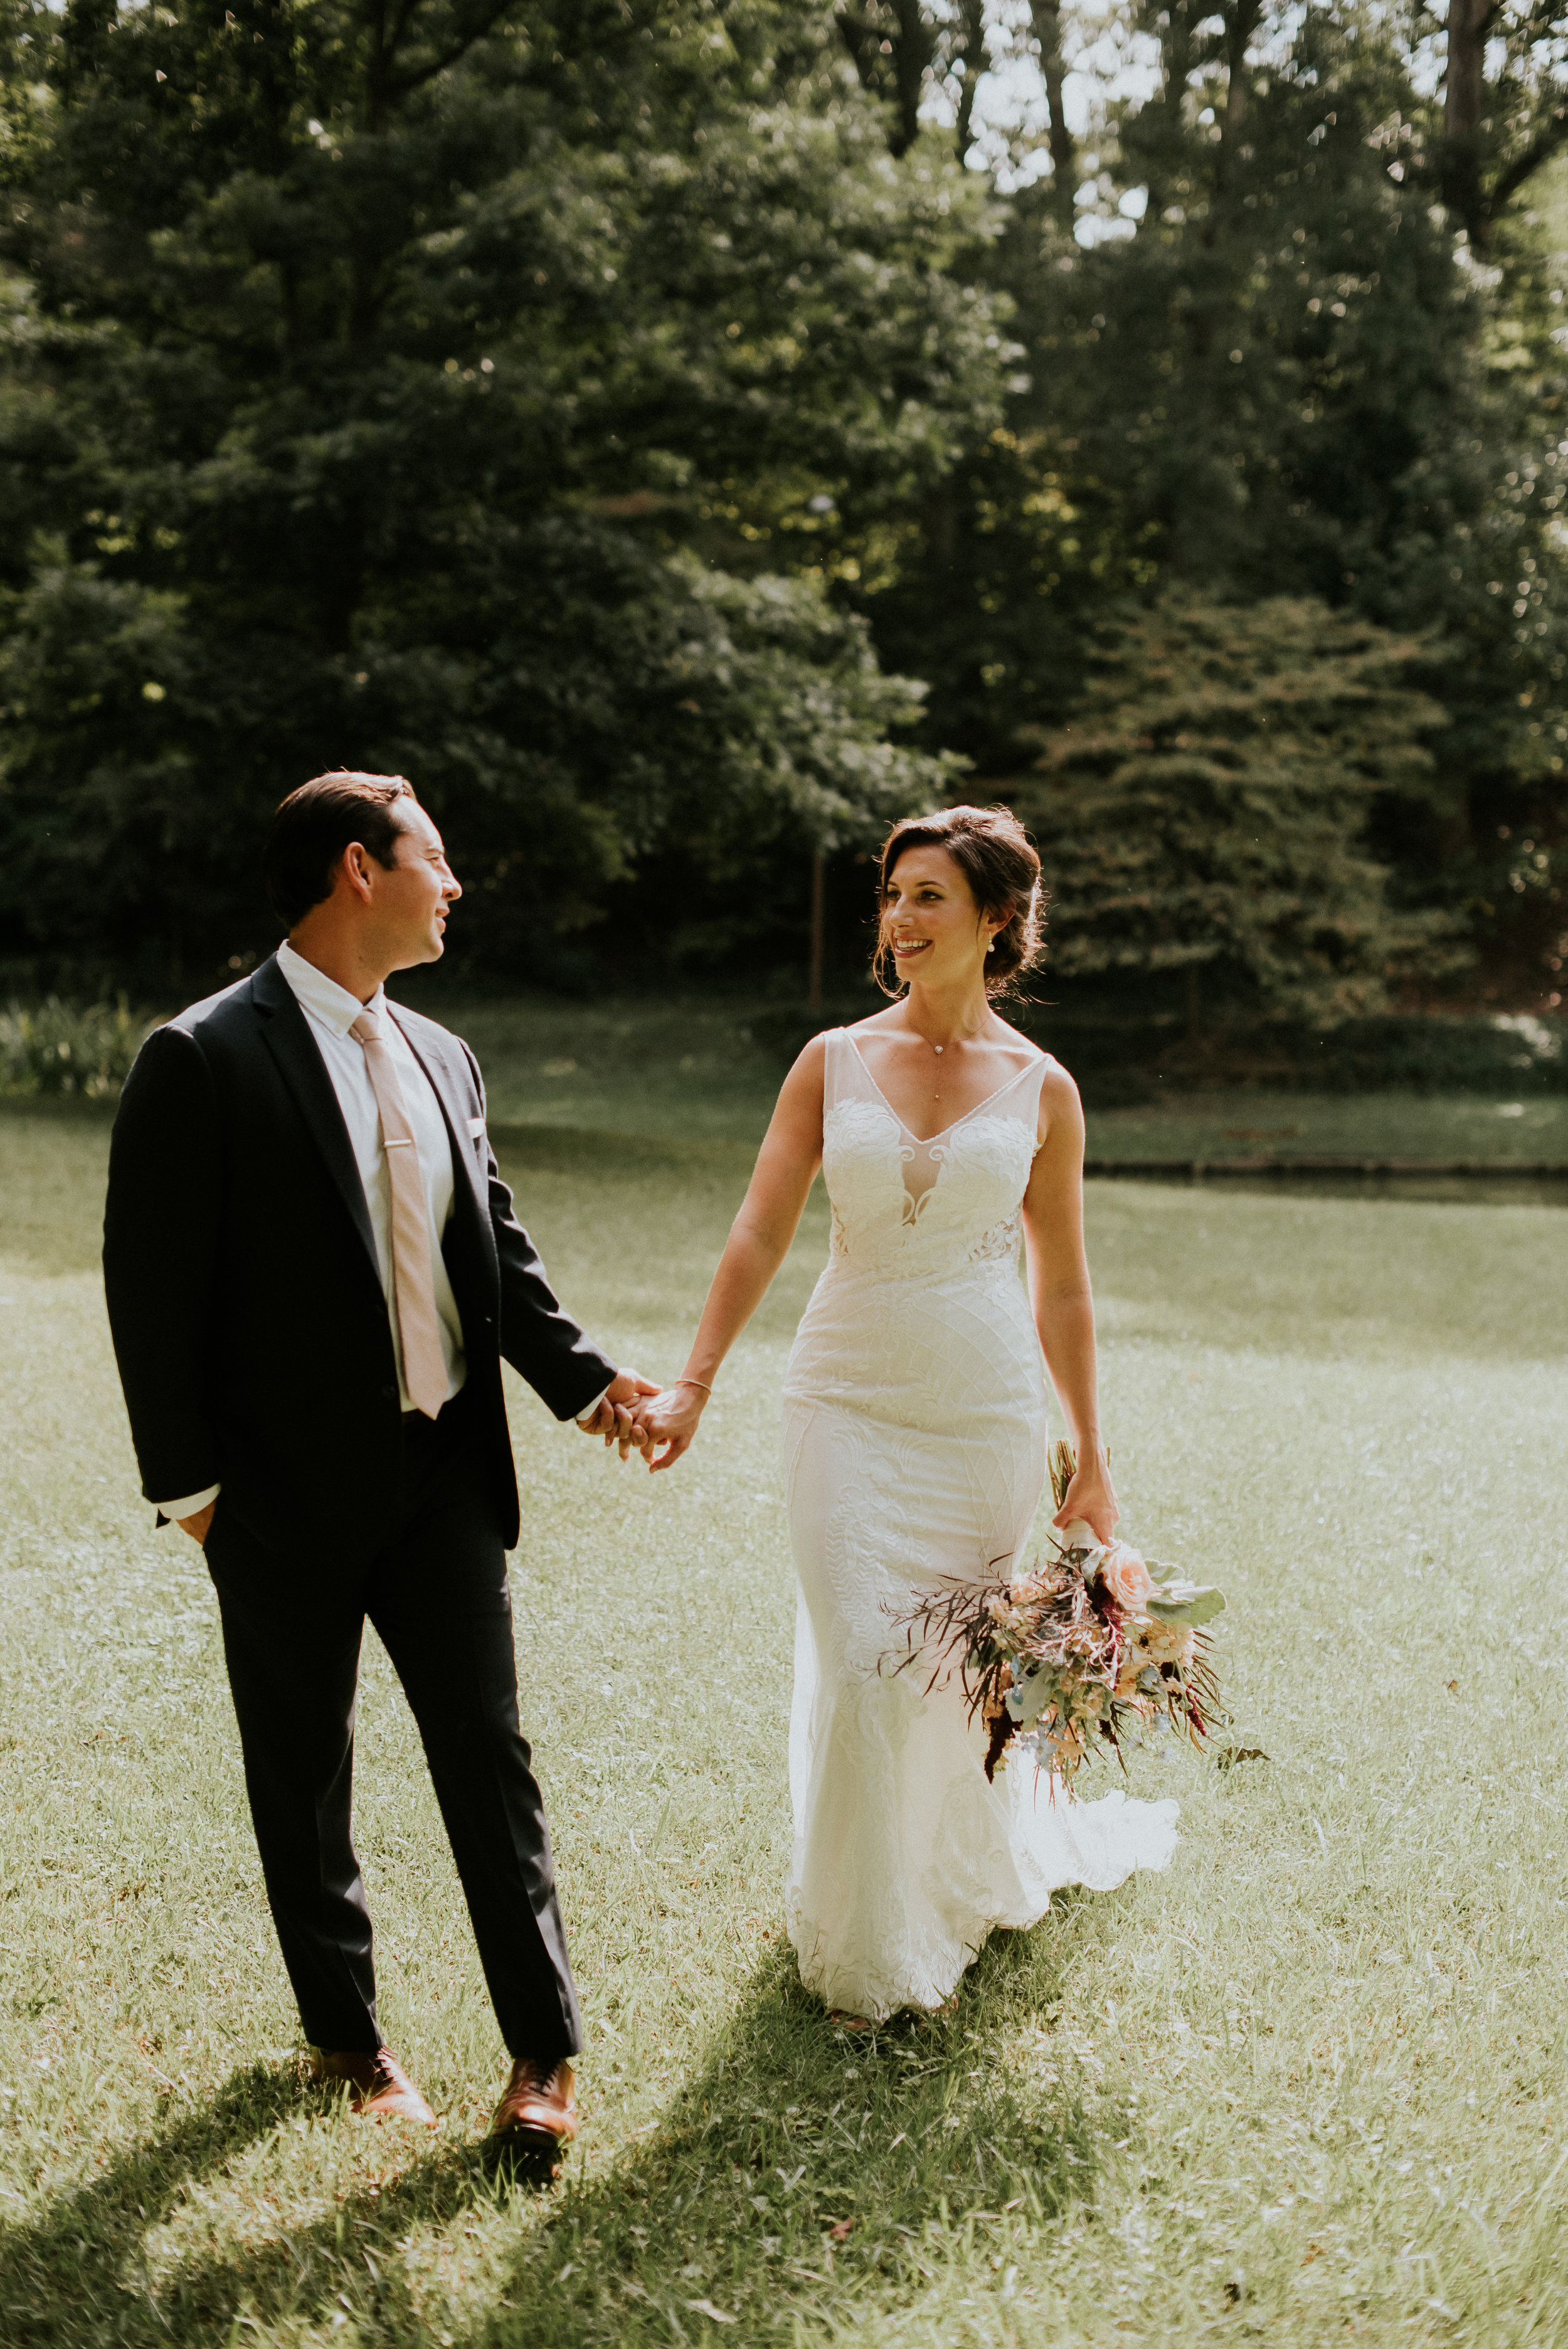 Bride and groom holding hands in Inman Park, Atlanta, GA